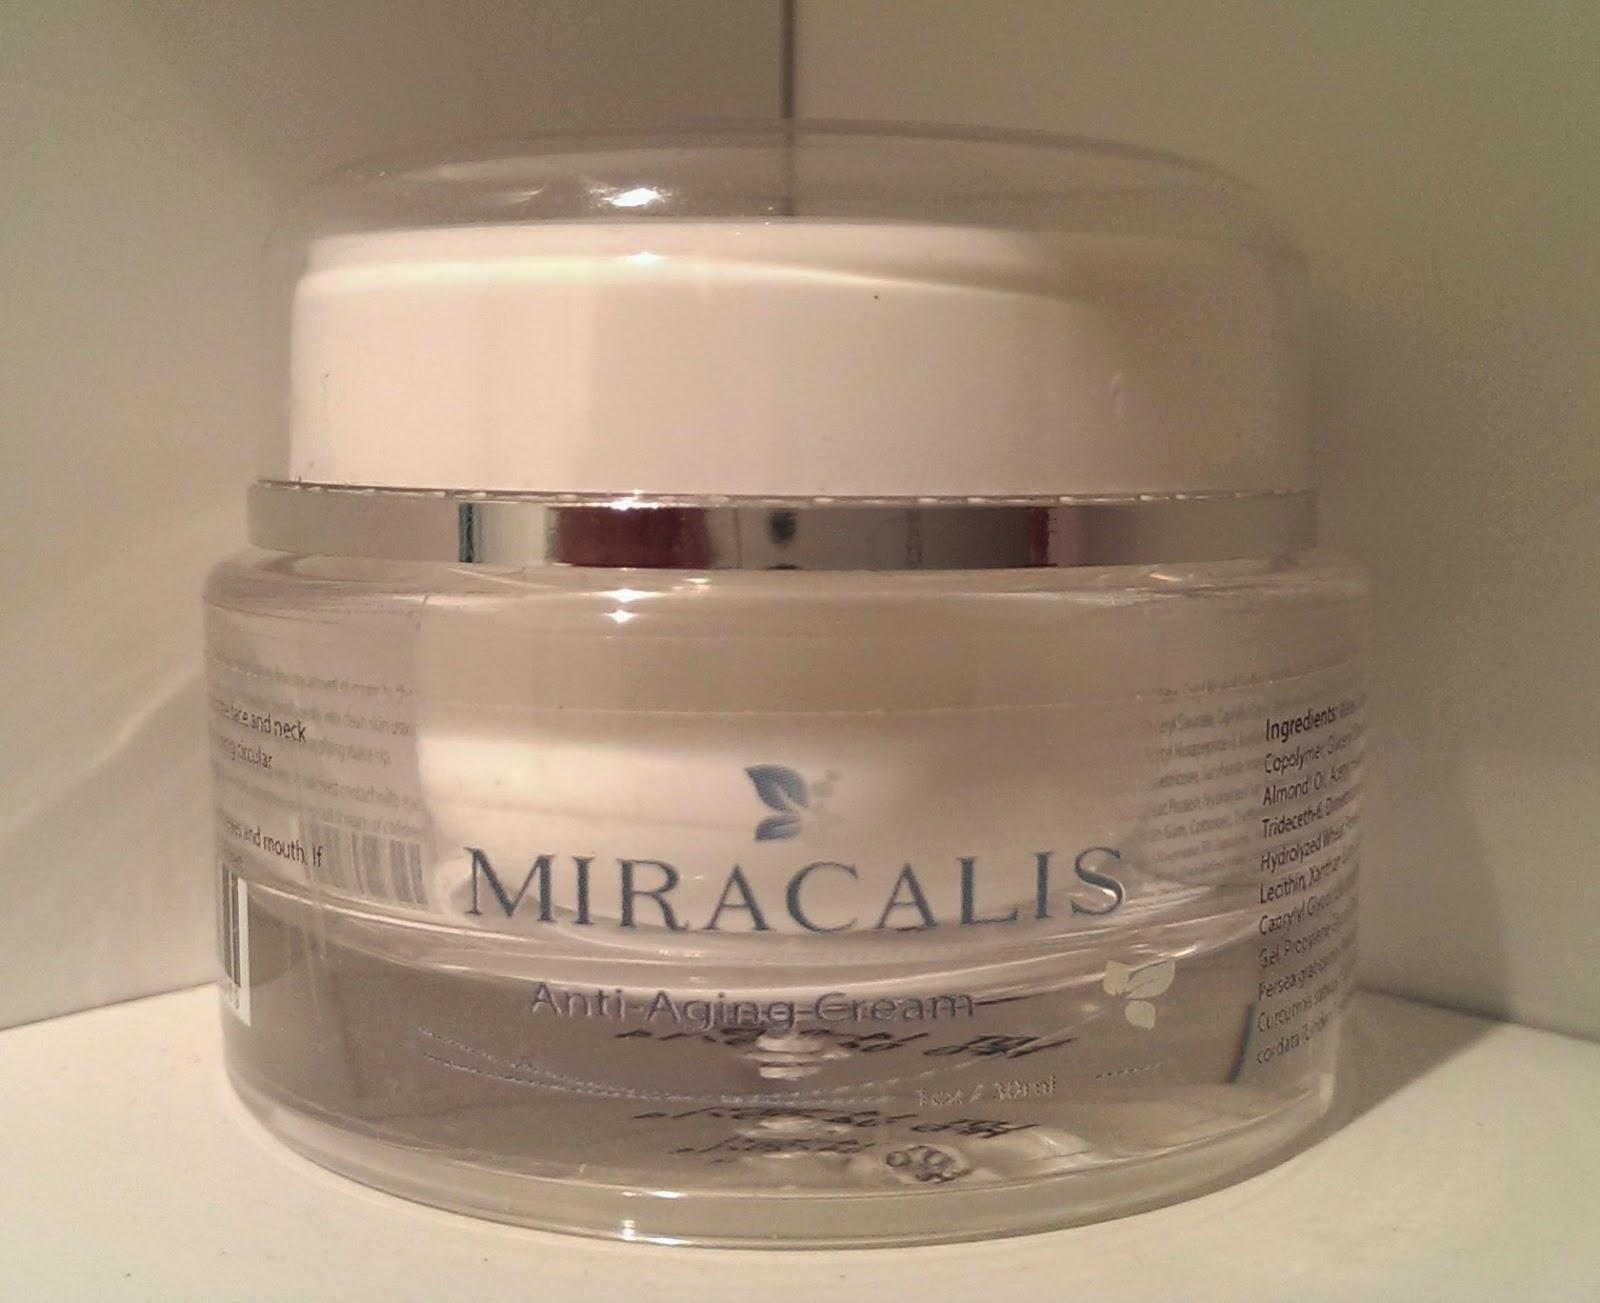 anti%2Baging%2Bcream Miracalis Anti-Aging Moisturizer Cream Review #Miracalis - Anti Aging Product